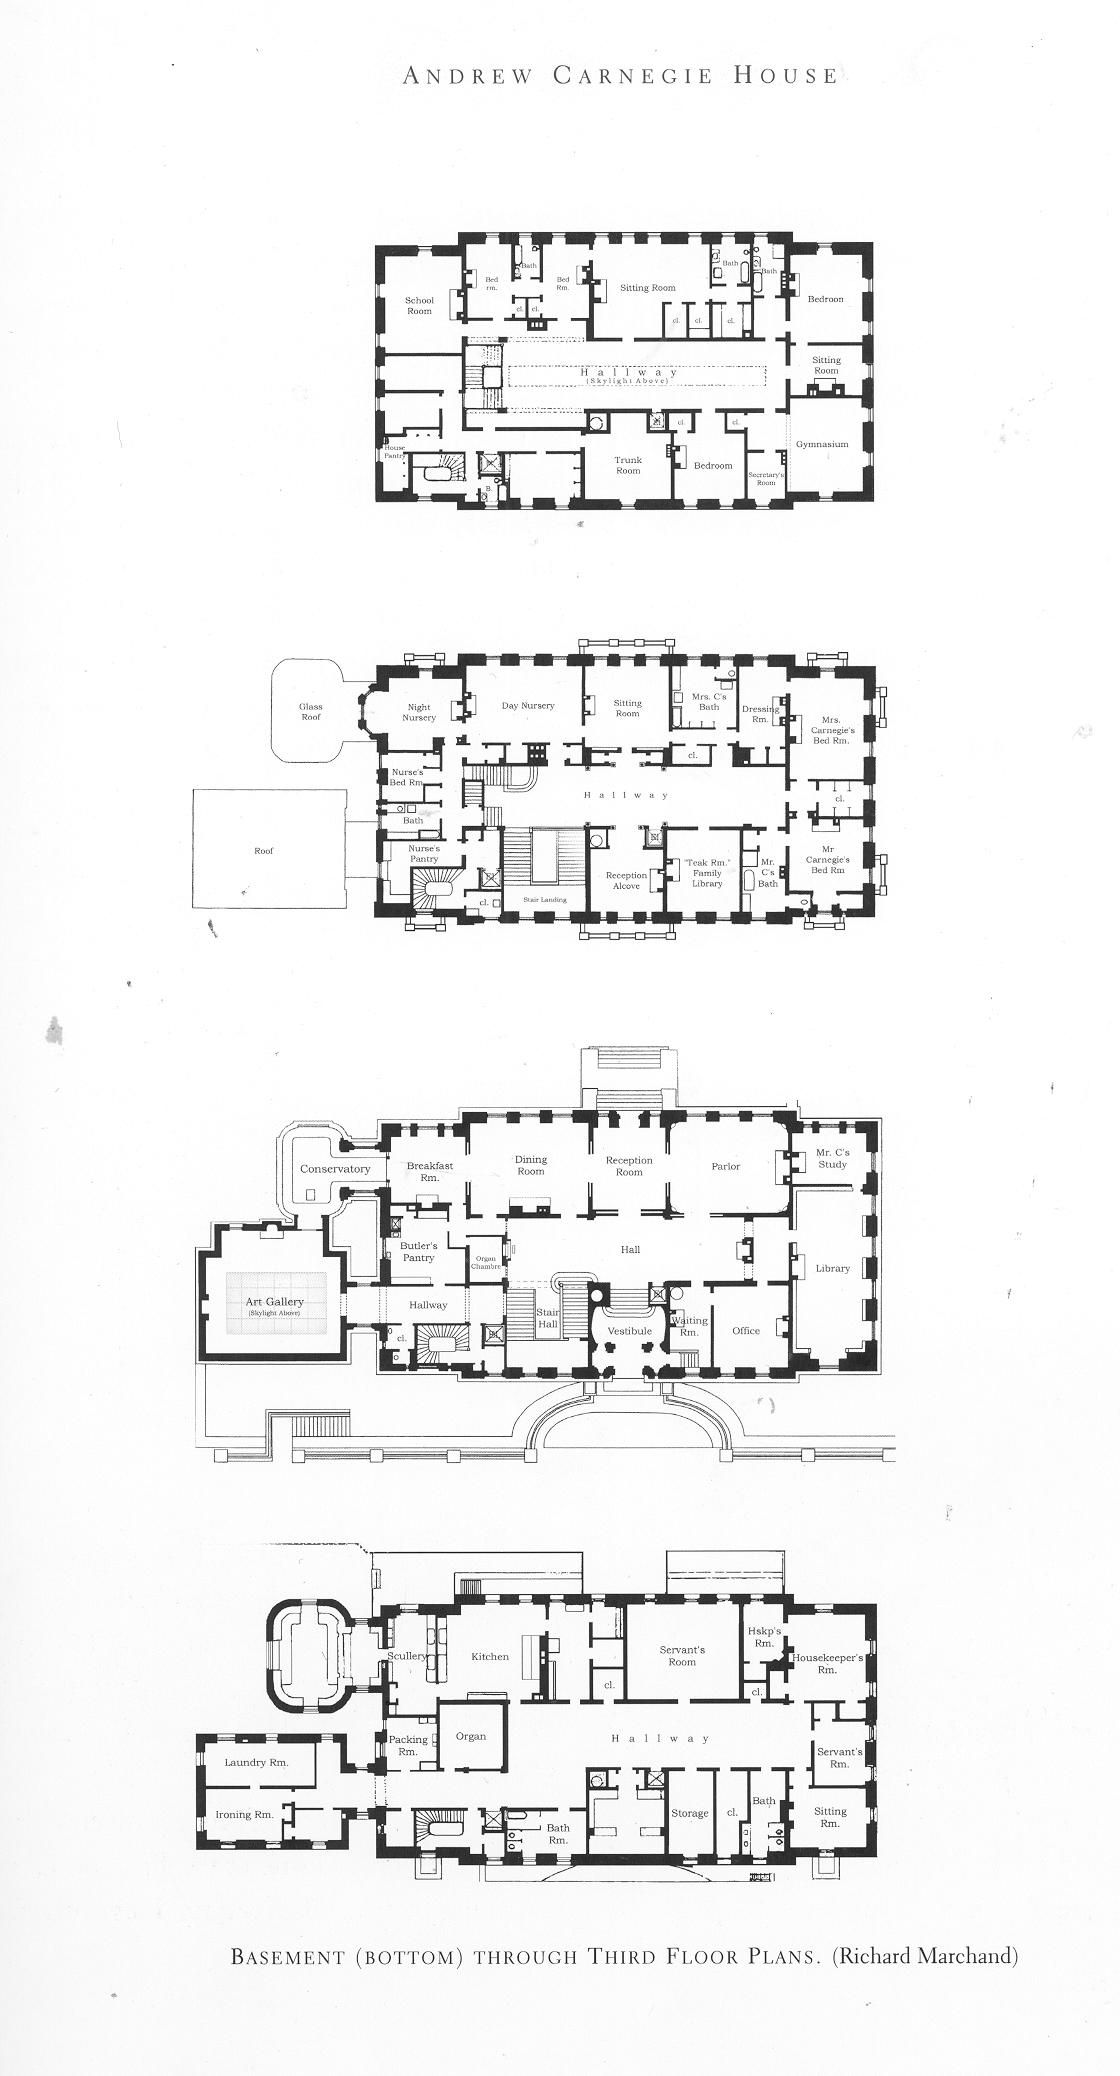 Andrew Carnegie Mansion Mansion Floor Plan Mansion Plans Architectural Floor Plans